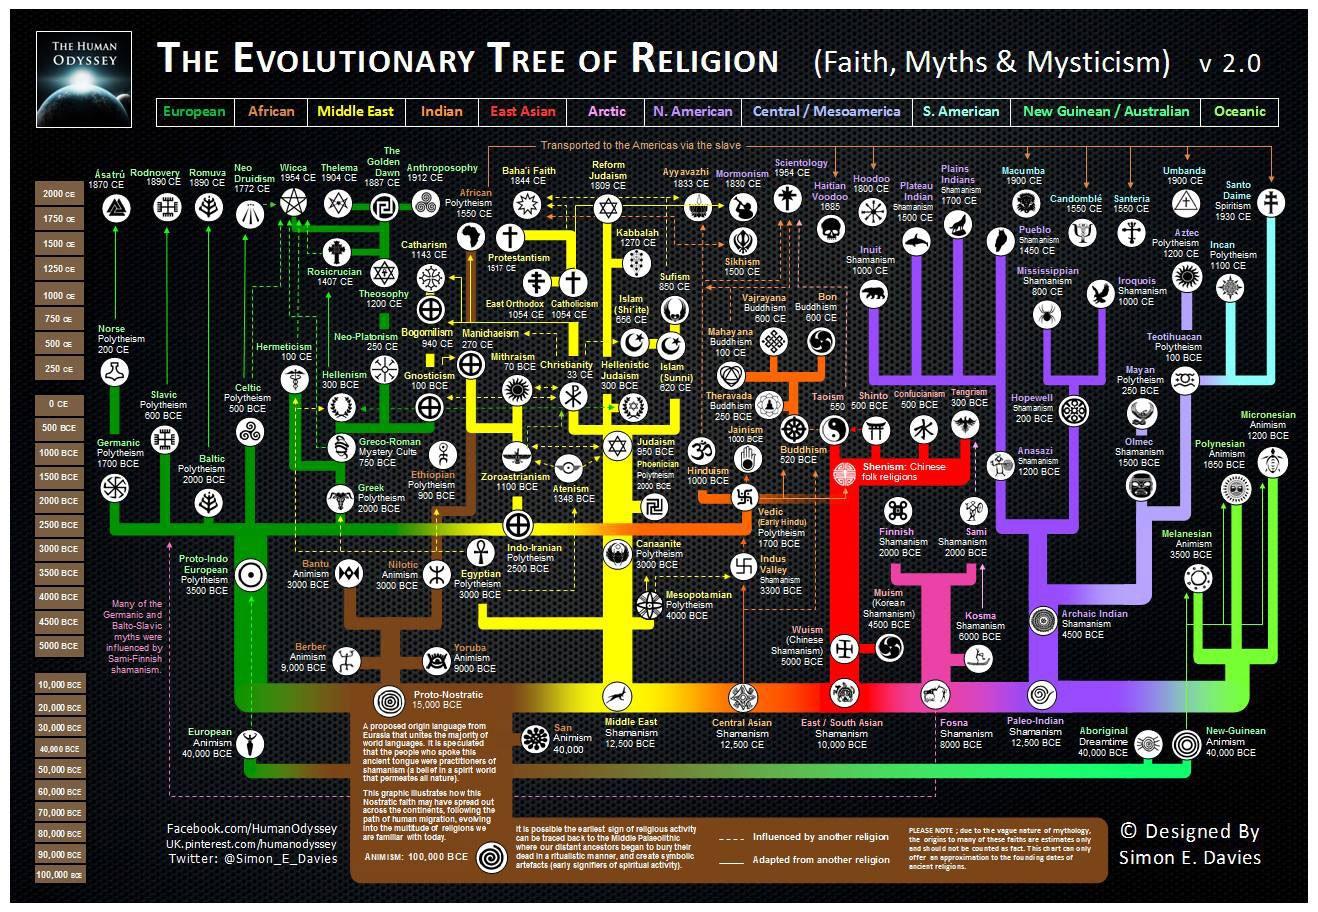 evolutionary-tree-religion-2.0